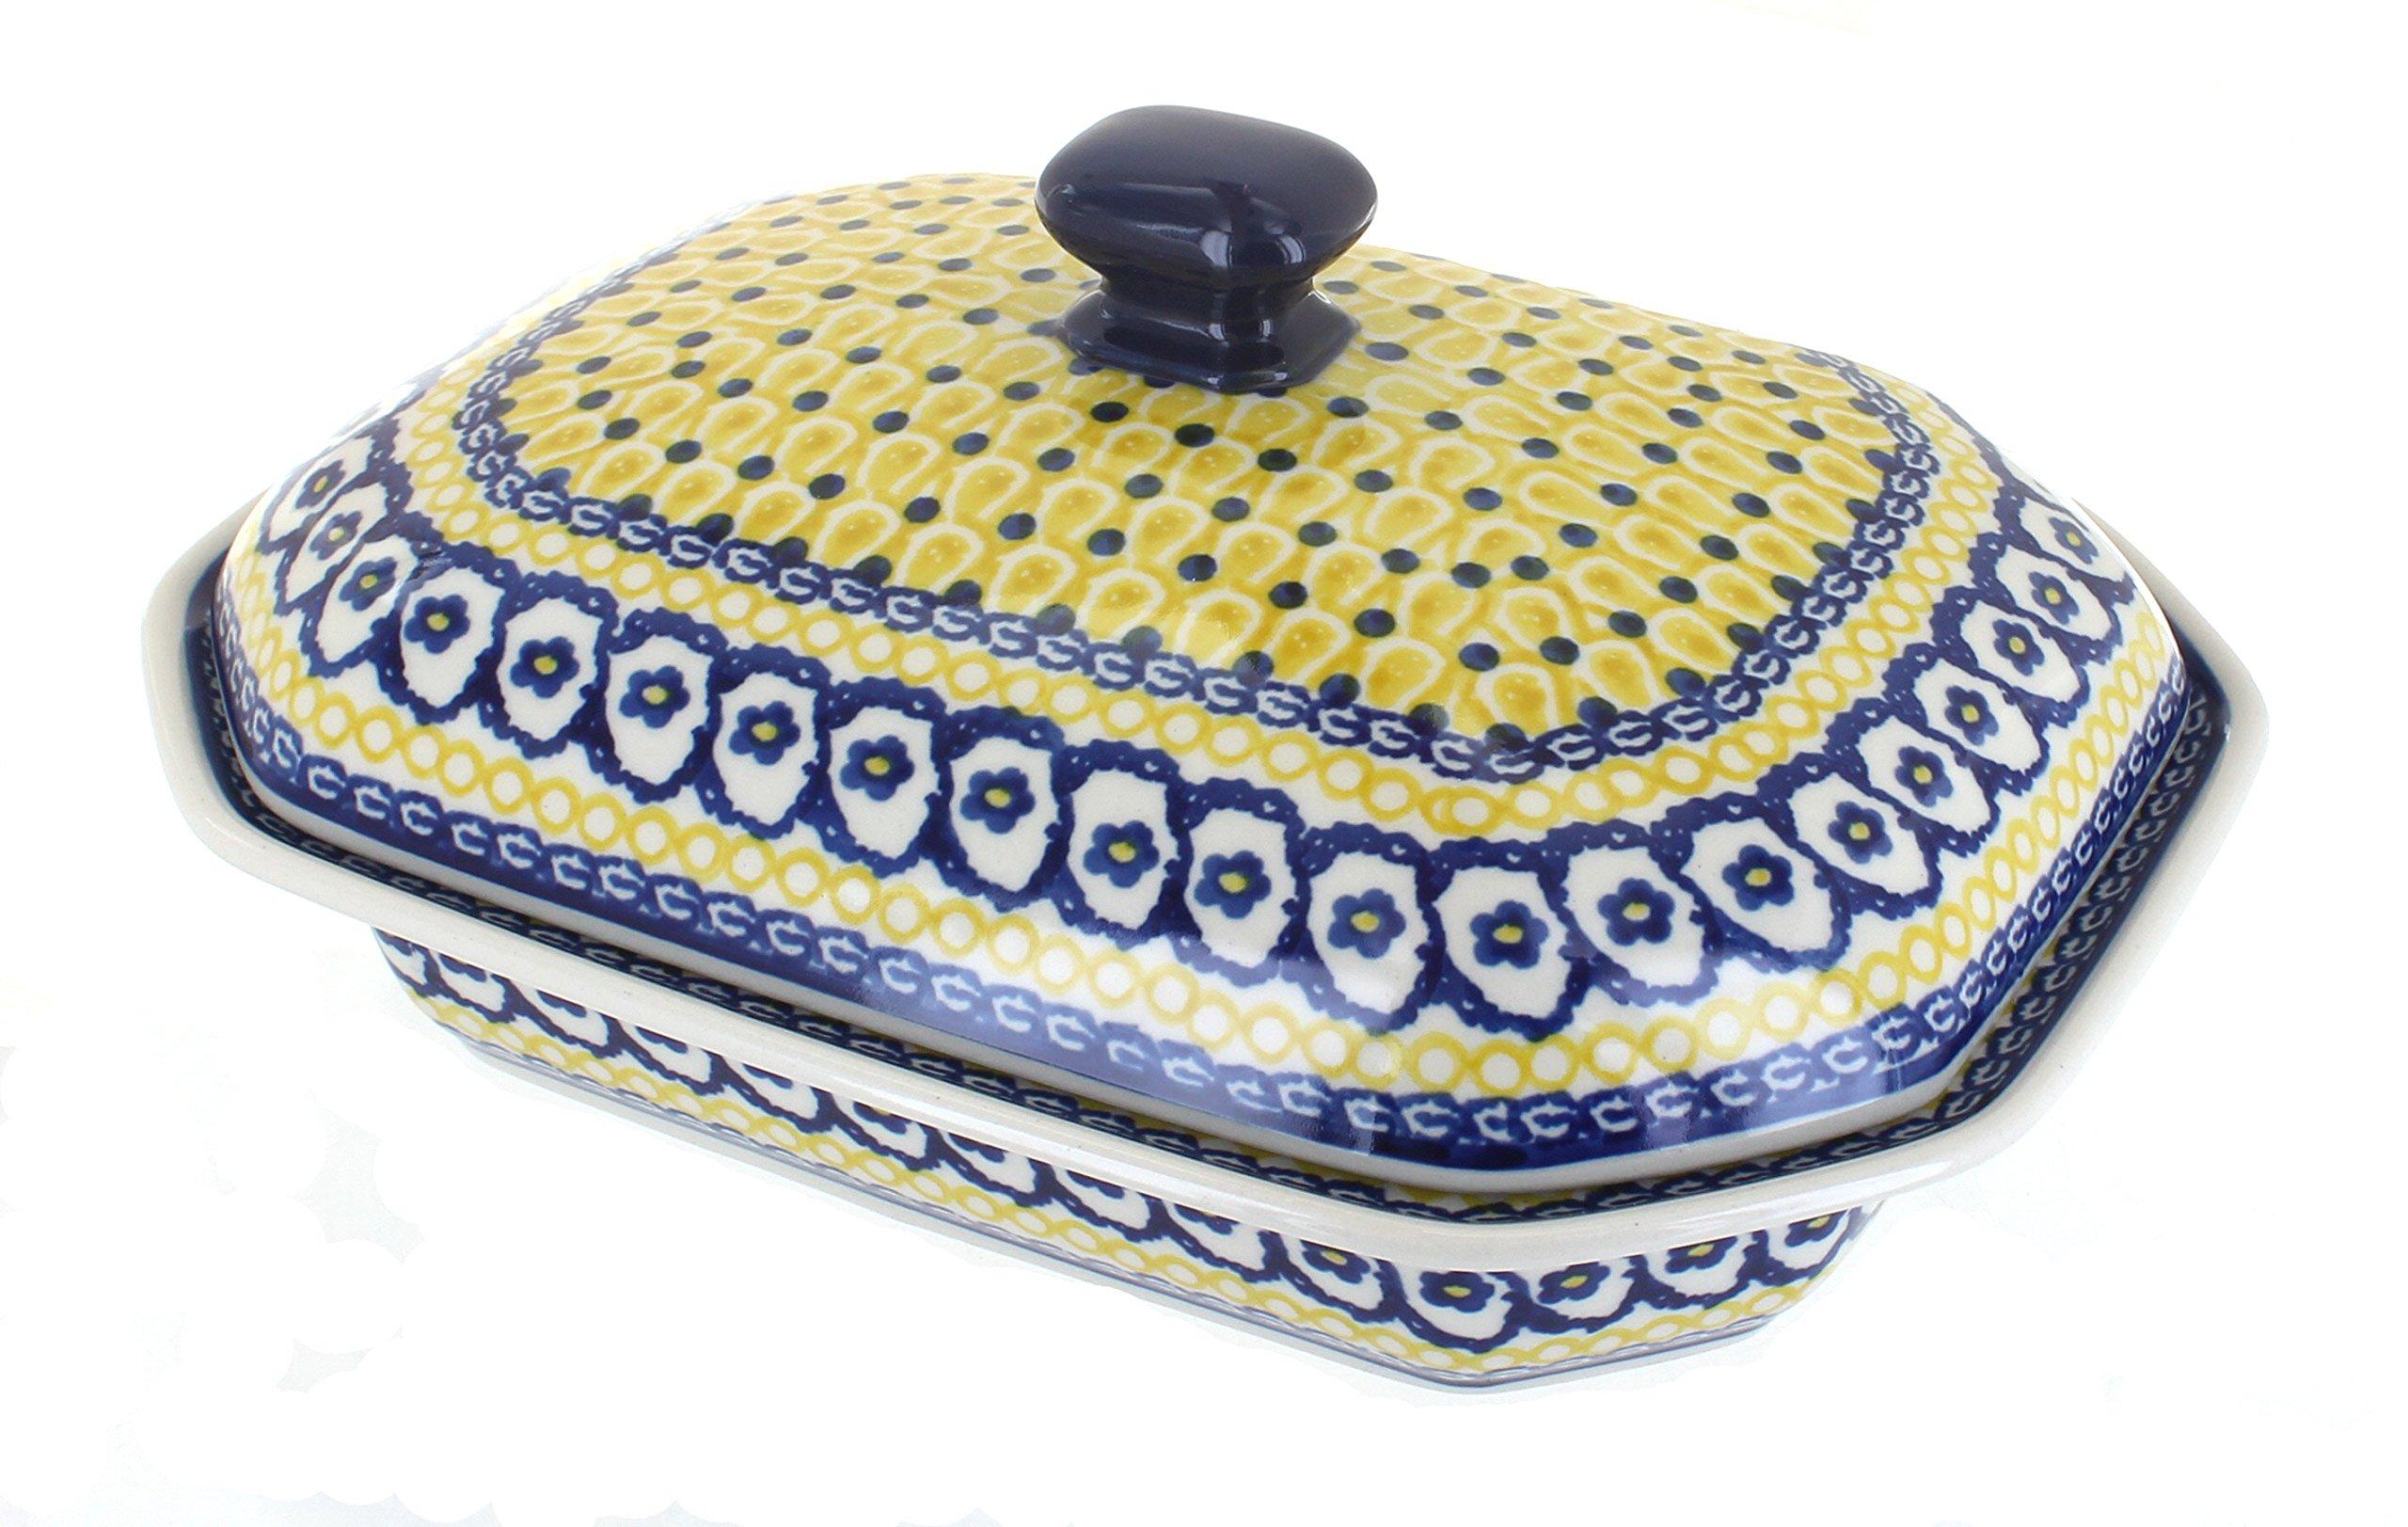 Polish Pottery Saffron Medium Covered Baking Dish